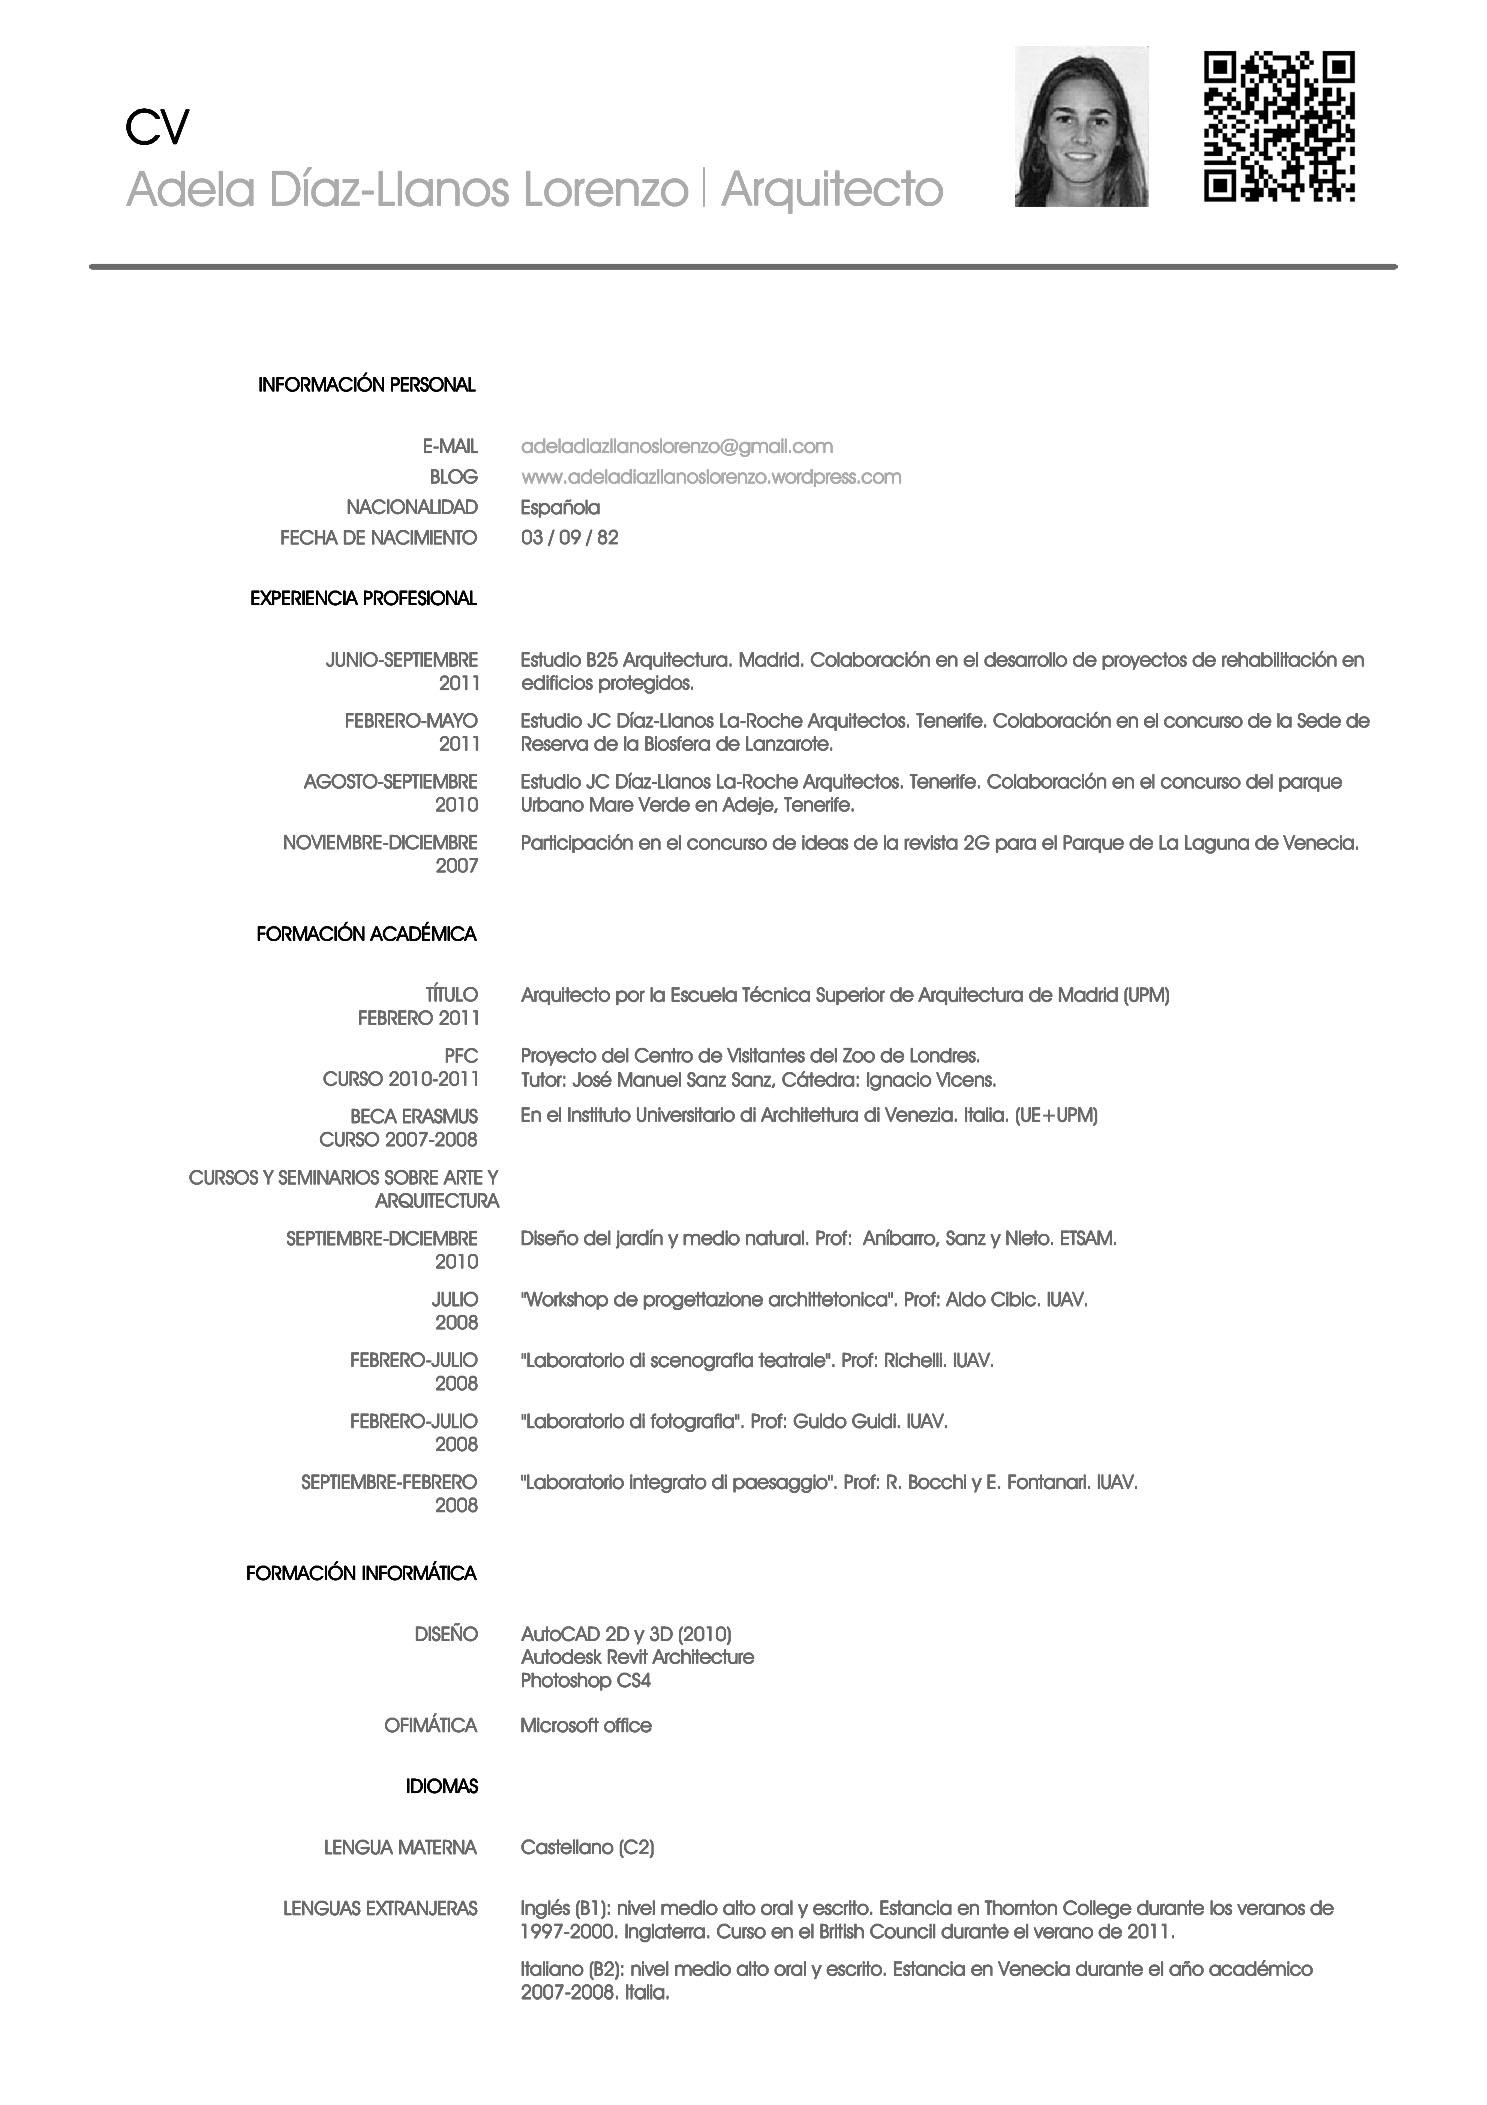 curriculum vitae espanol word cv resume office templates curriculum vitae curriculum vitae template en espanol